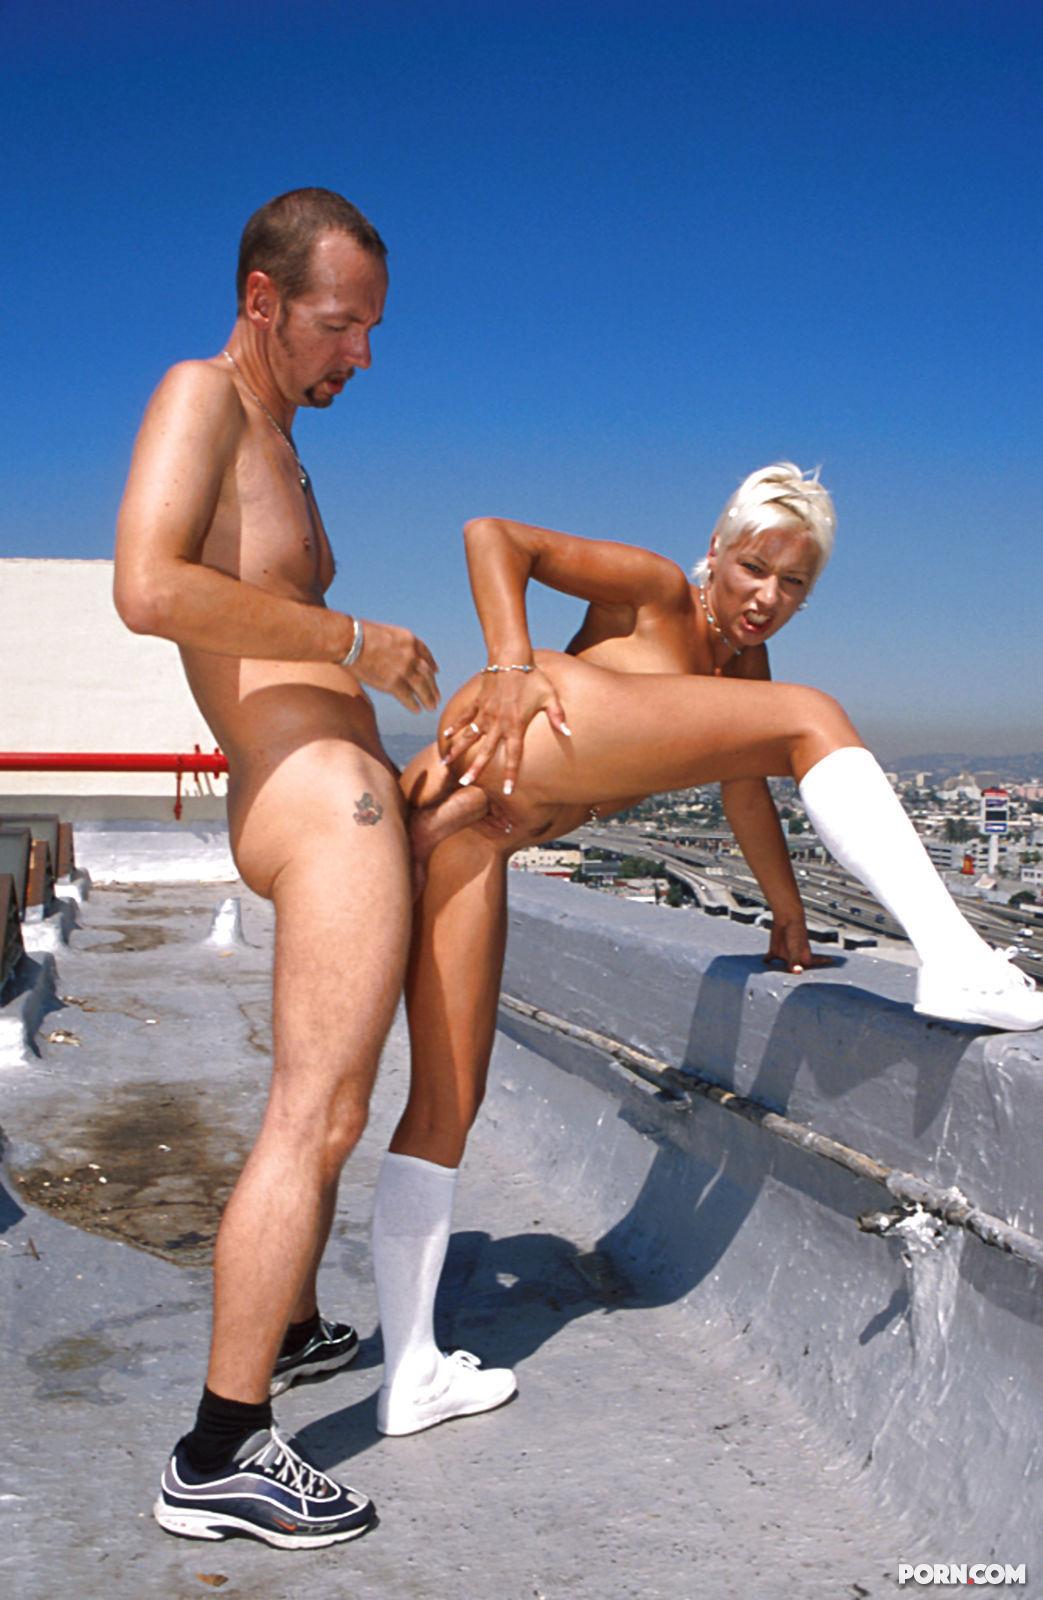 Секс на корыше 5 фотография